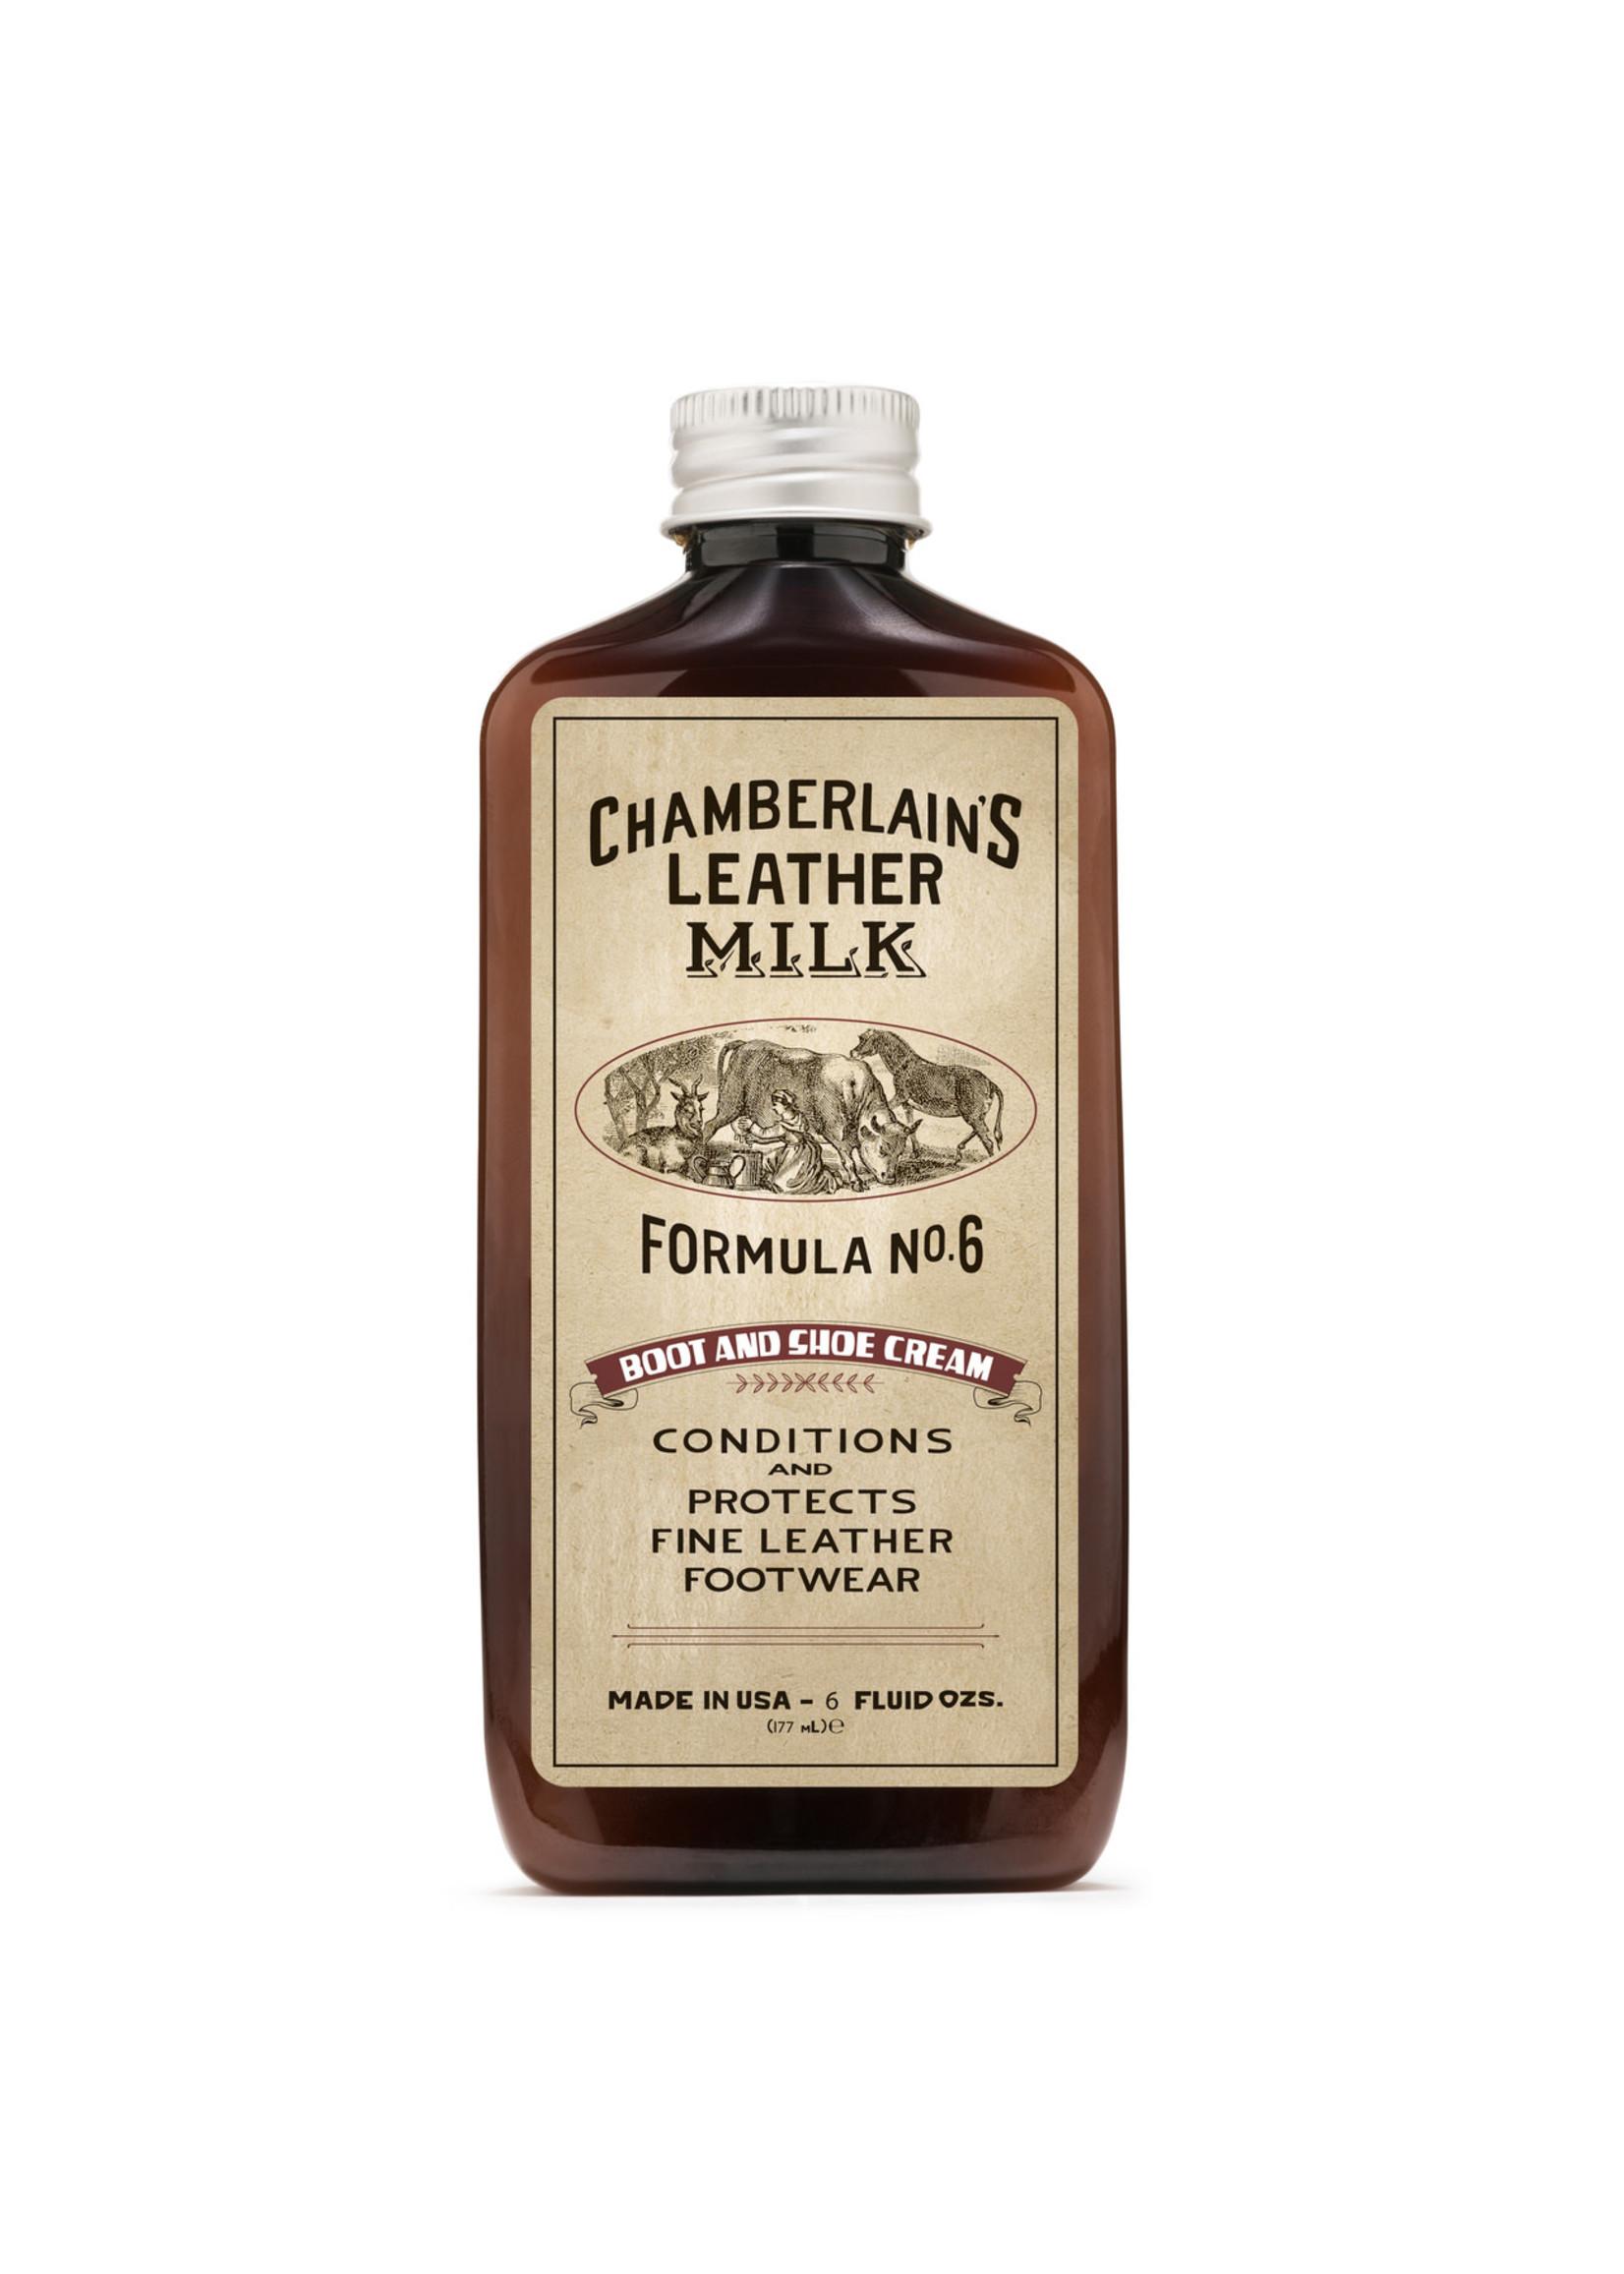 Chamberlain's Leather Milk Chamberlain's Leather Milk - Formula No. 6 Boot and Shoe Cream 6 Oz